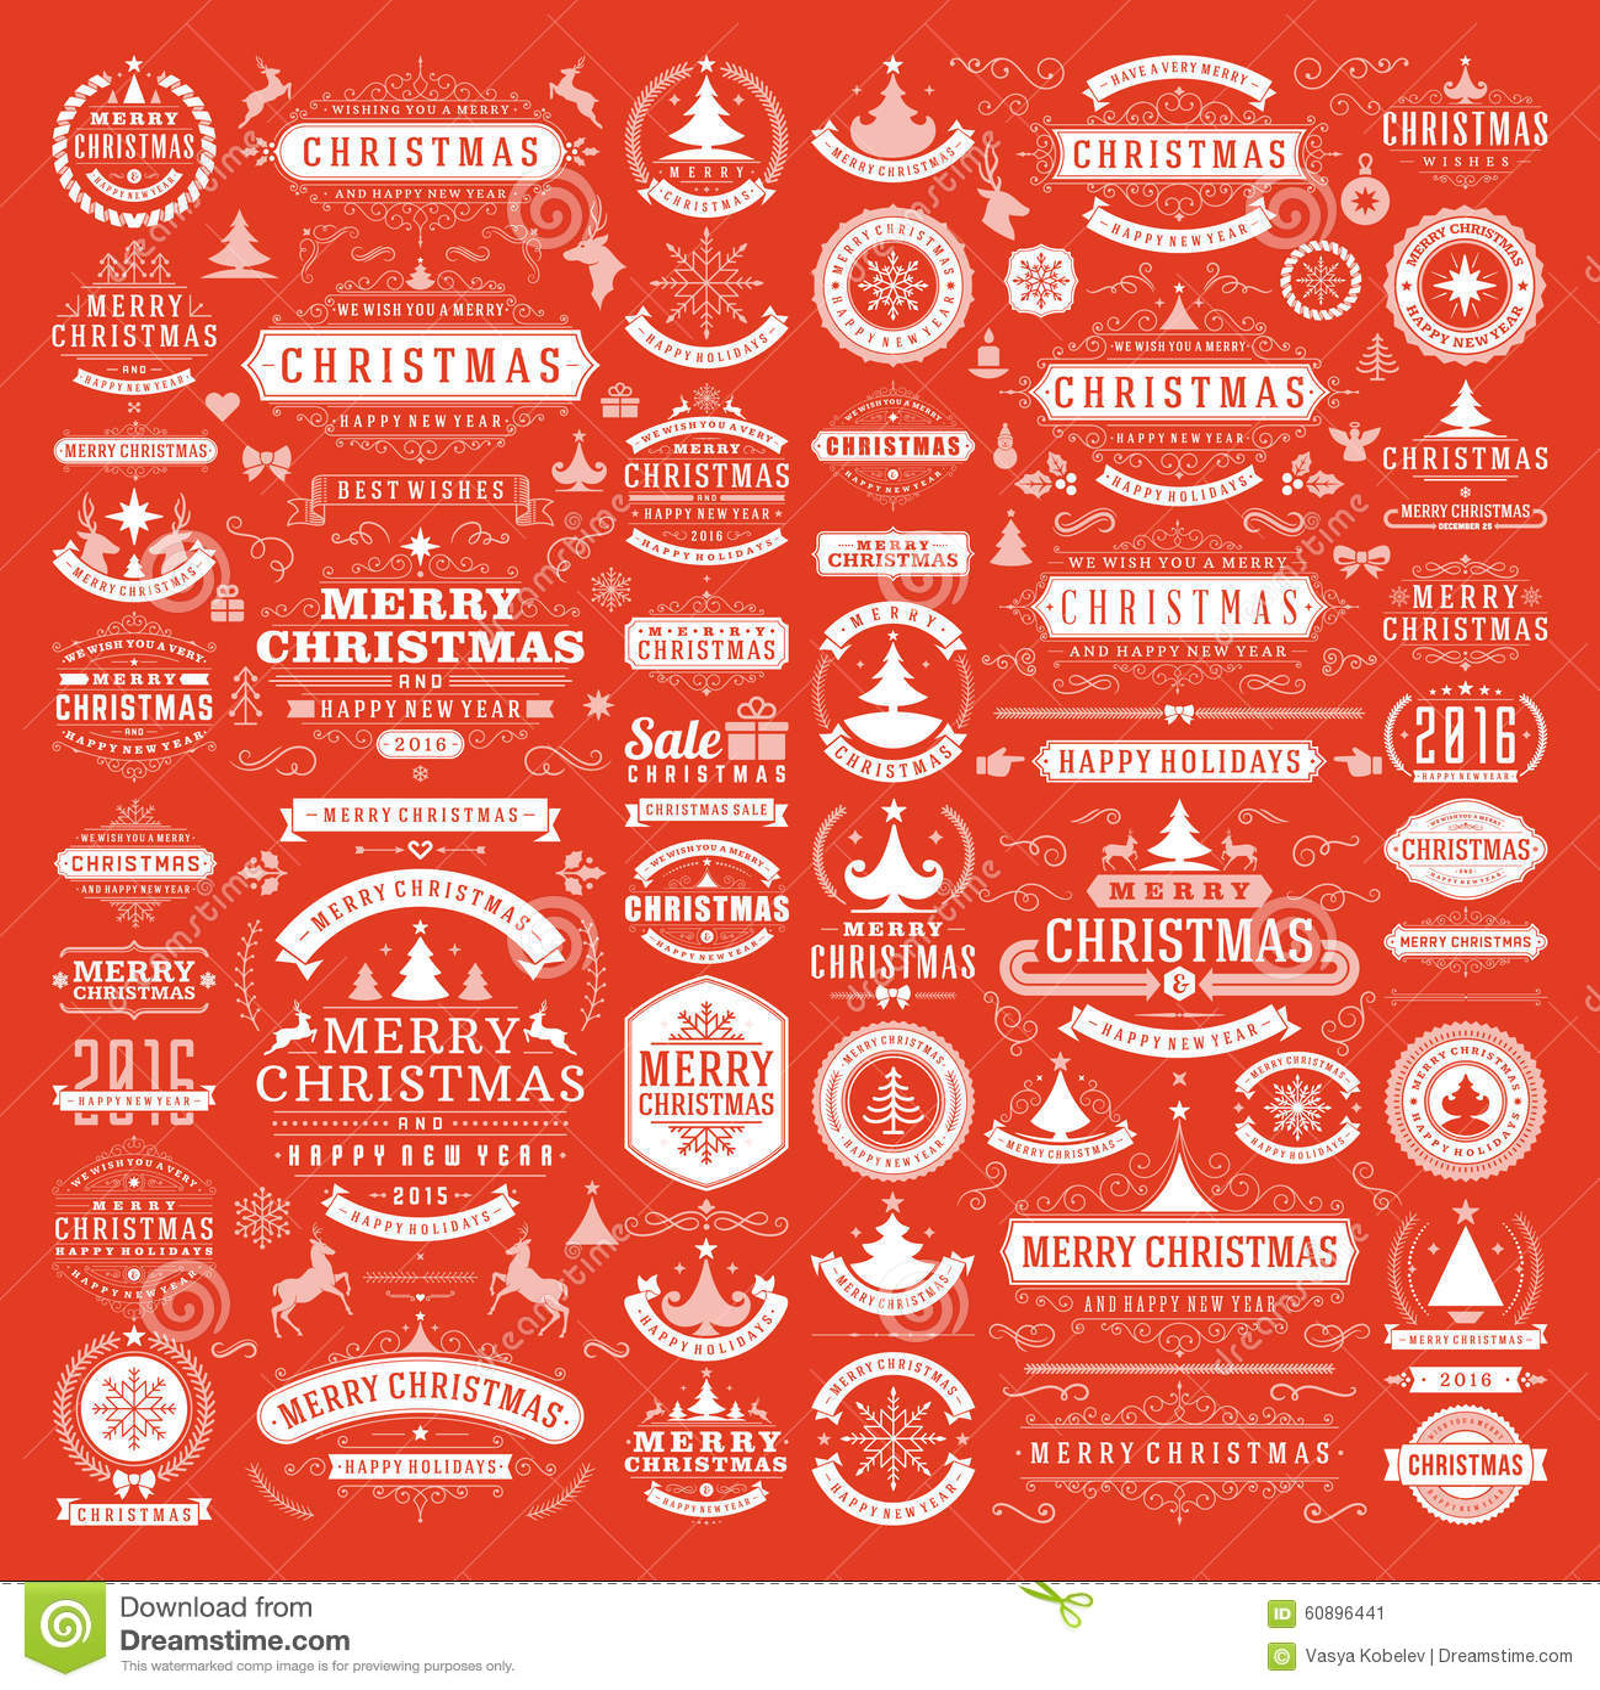 Christmas Tree Decoration Elements: Christmas Decorations Vector Design Elements Stock Vector